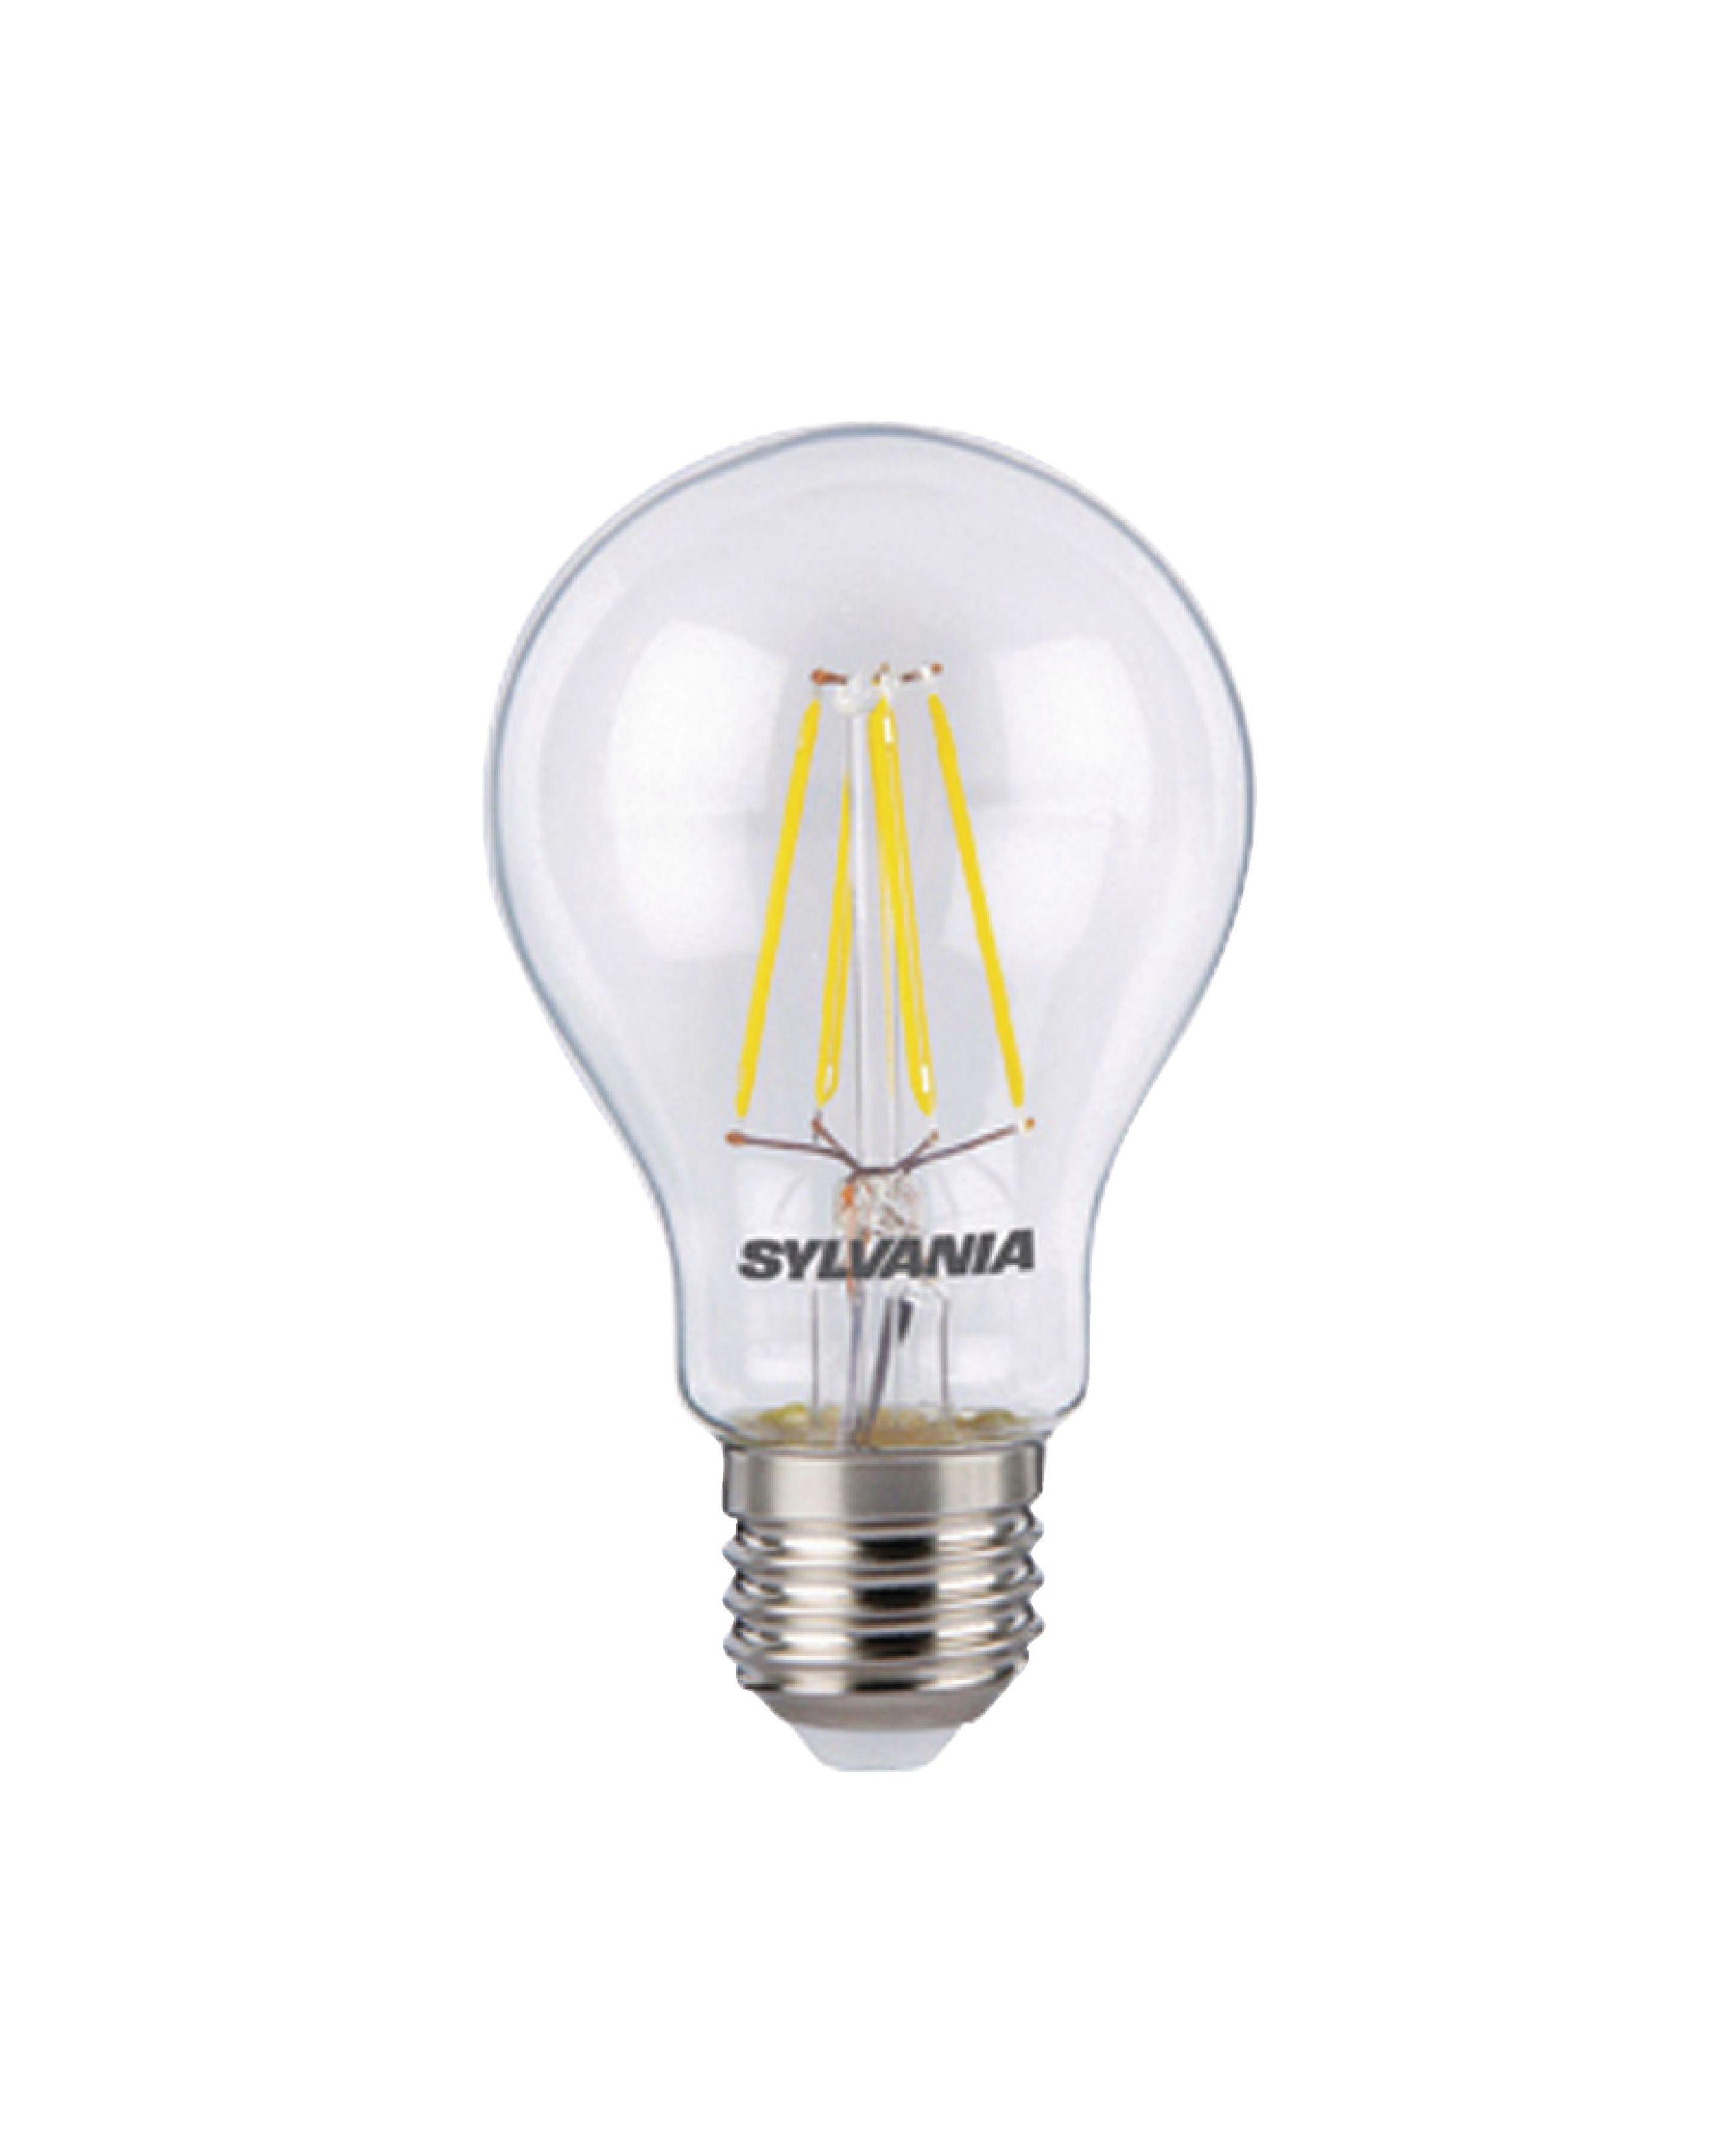 syl 0027160 sylvania led retro filament lamp e27 a60 4 w 470 lm 2700 k electronic. Black Bedroom Furniture Sets. Home Design Ideas